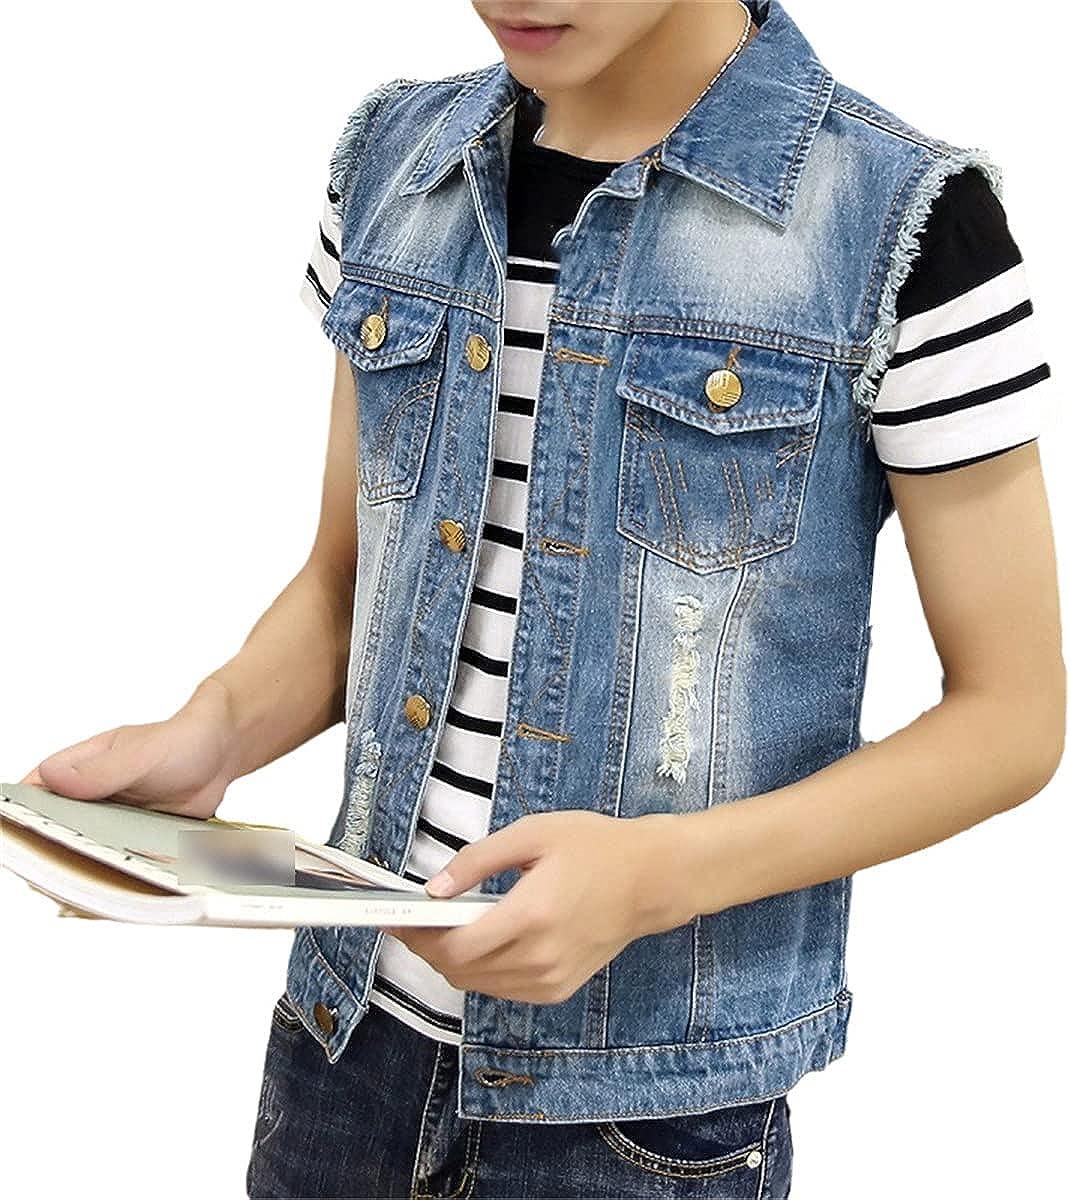 Ripped Denim Jacket Men's Denim Vest Hip-Hop Denim Jacket Sleeveless